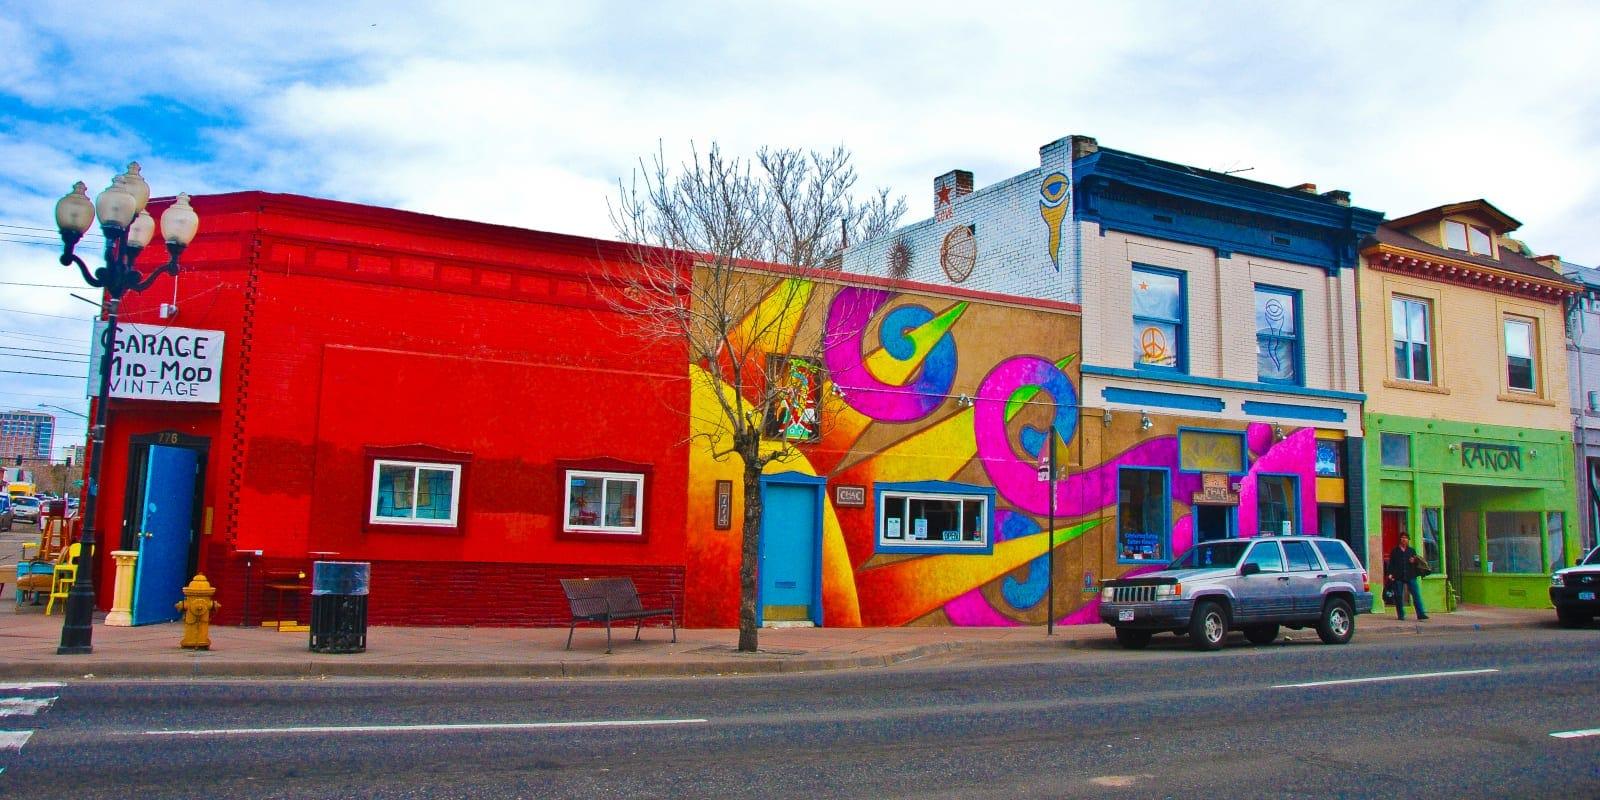 Culture Attractions Santa Fe Arts District Denver Garage Mid Mod Antique Store